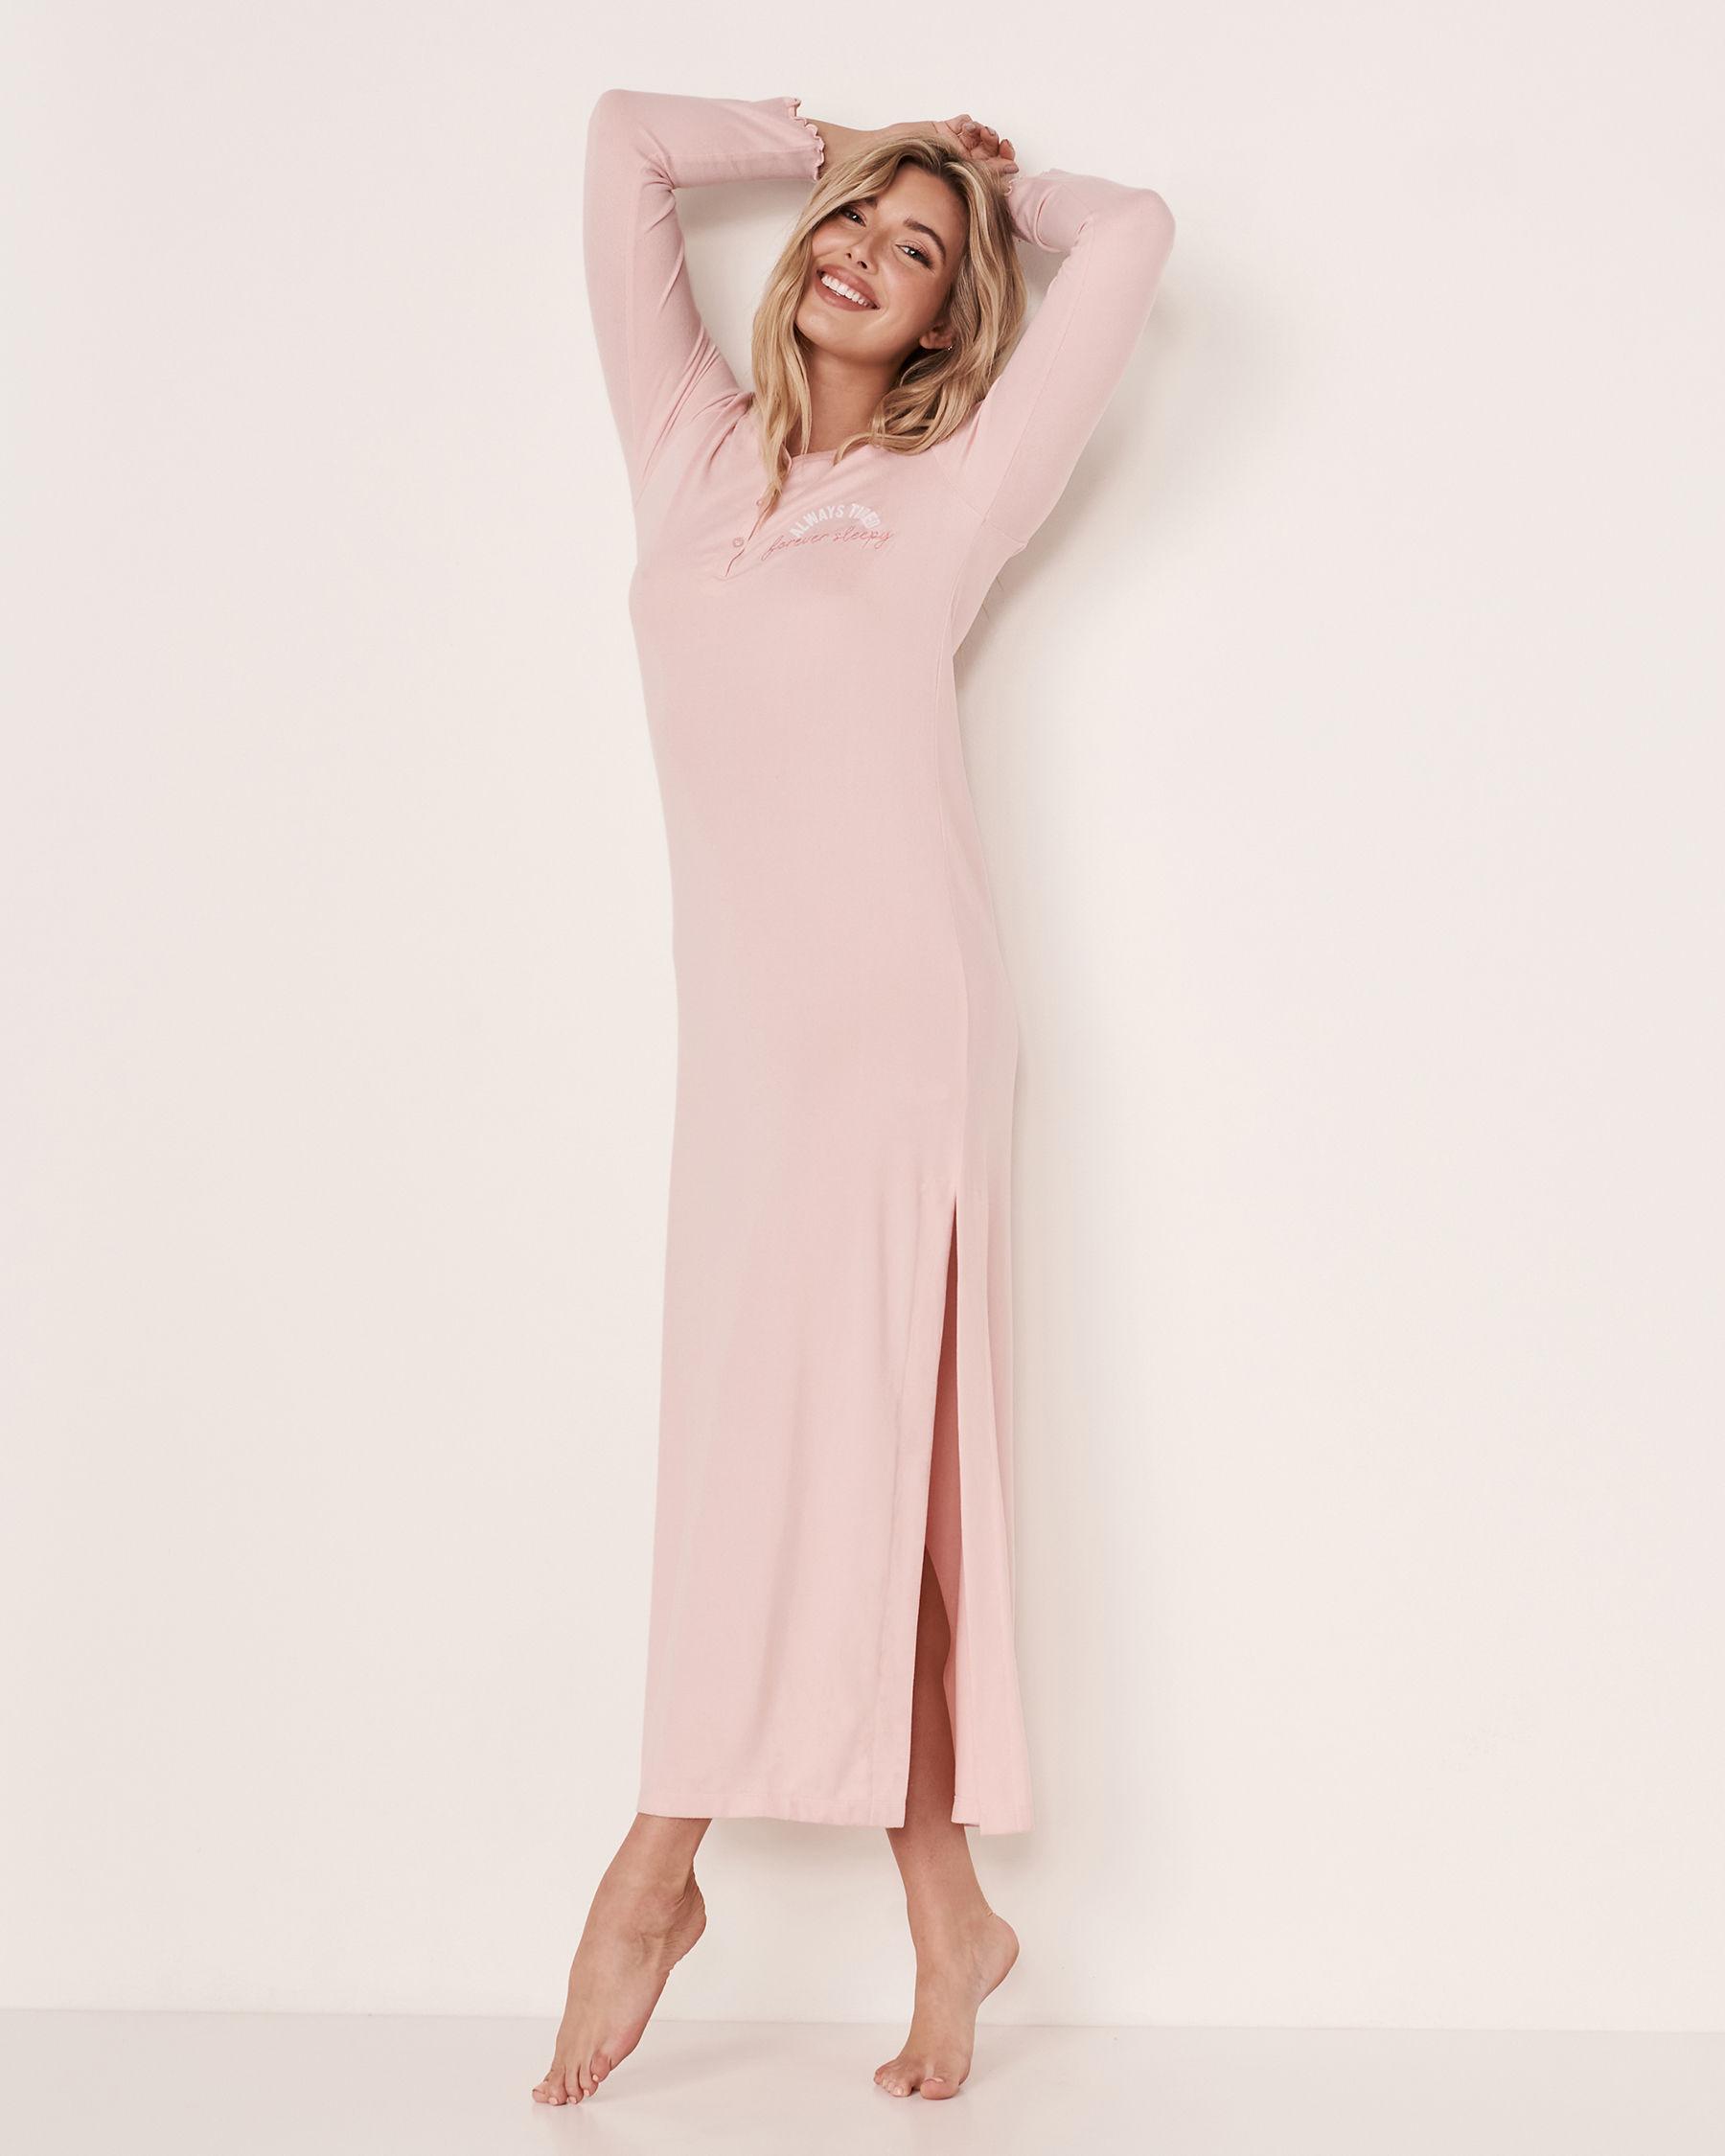 LA VIE EN ROSE Recycled Fibers Maxi Sleepshirt Light pink 40500068 - View1